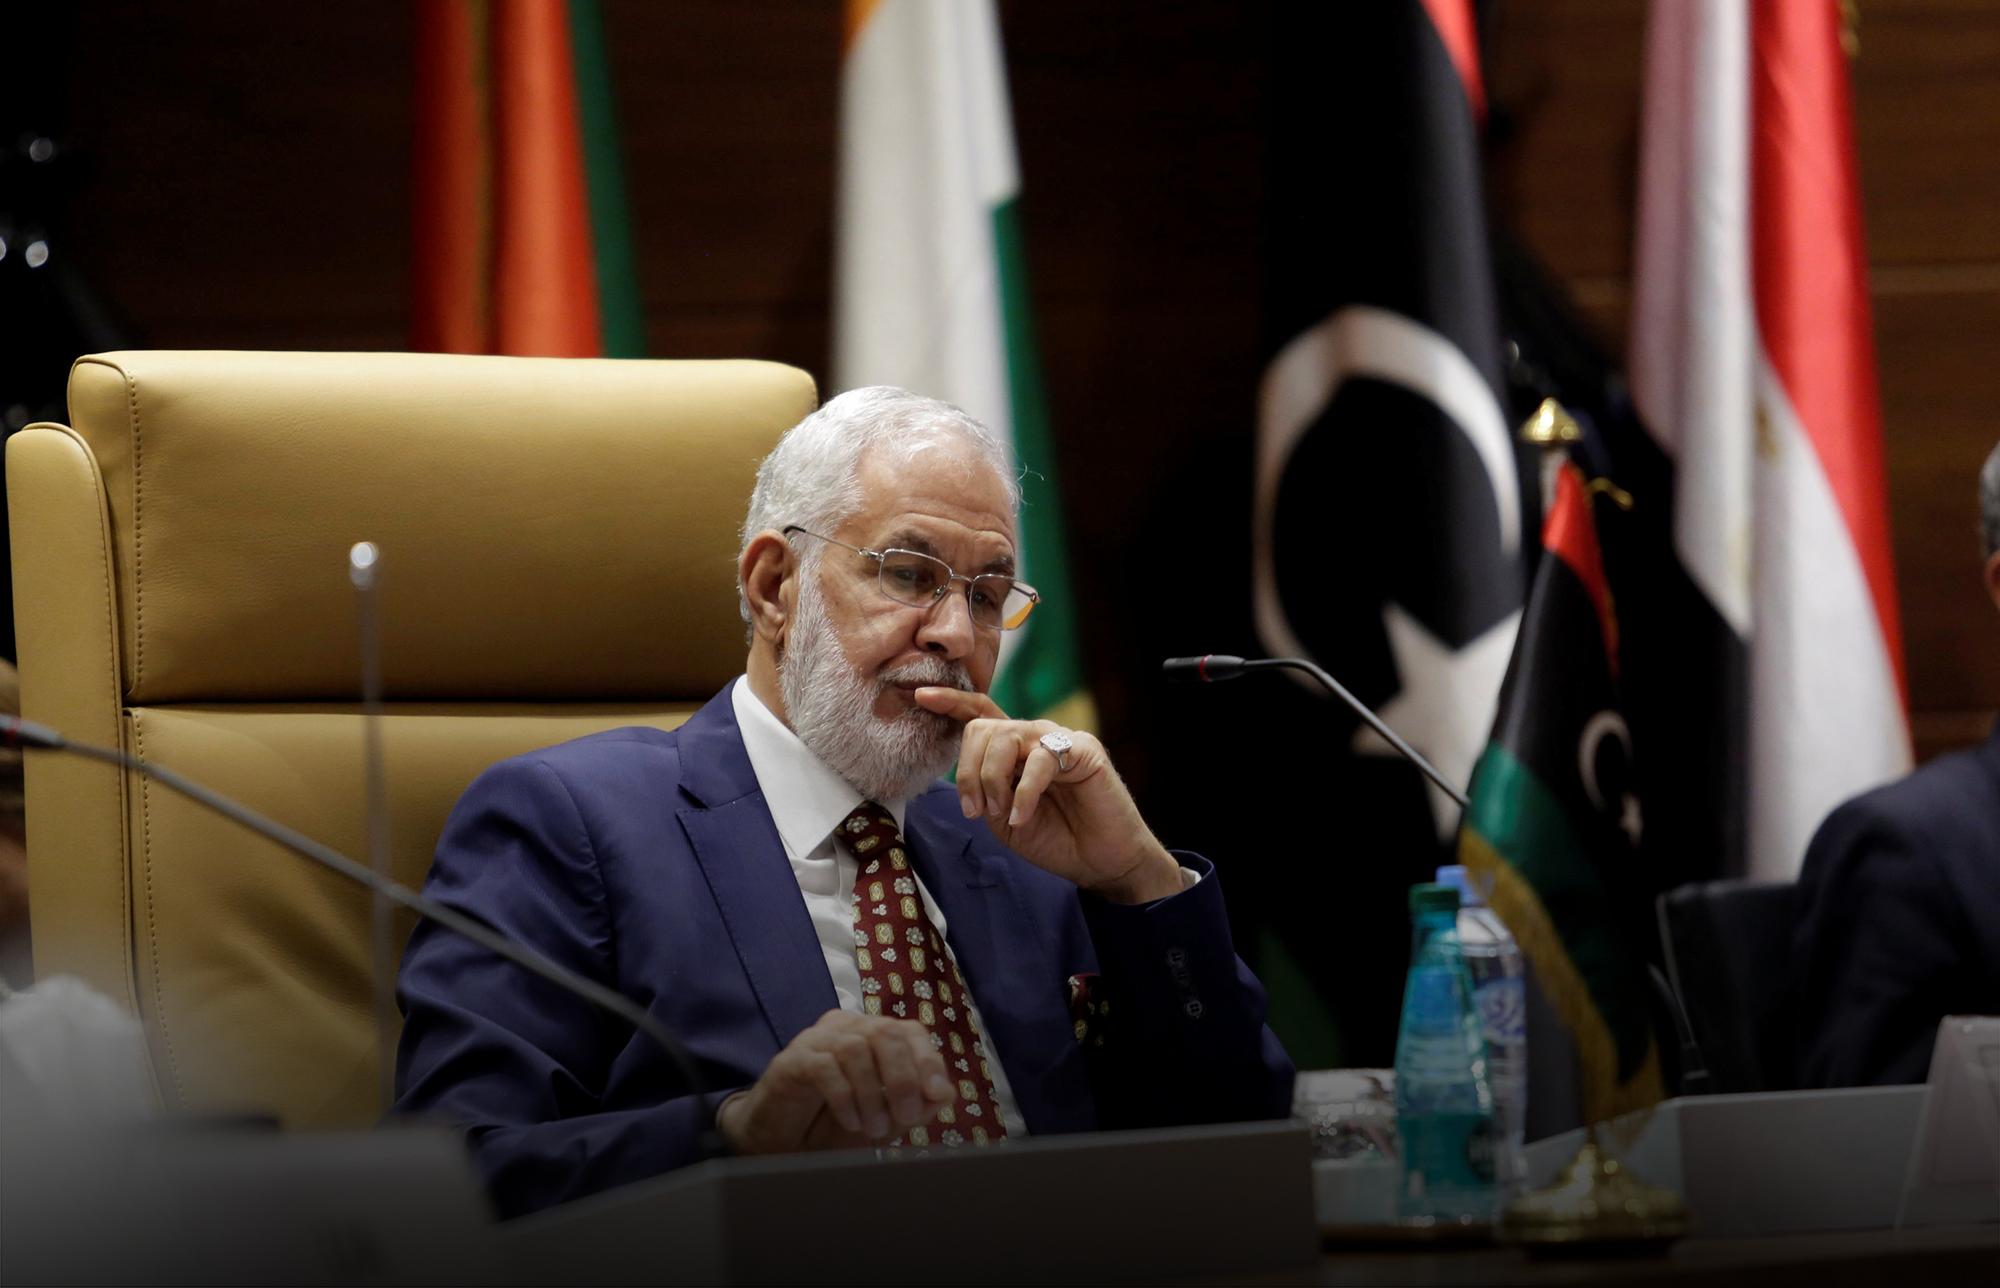 Photo of الوفاق أمام ضغوط أوروبية لإلغاء اتفاقيتها مع أنقرة